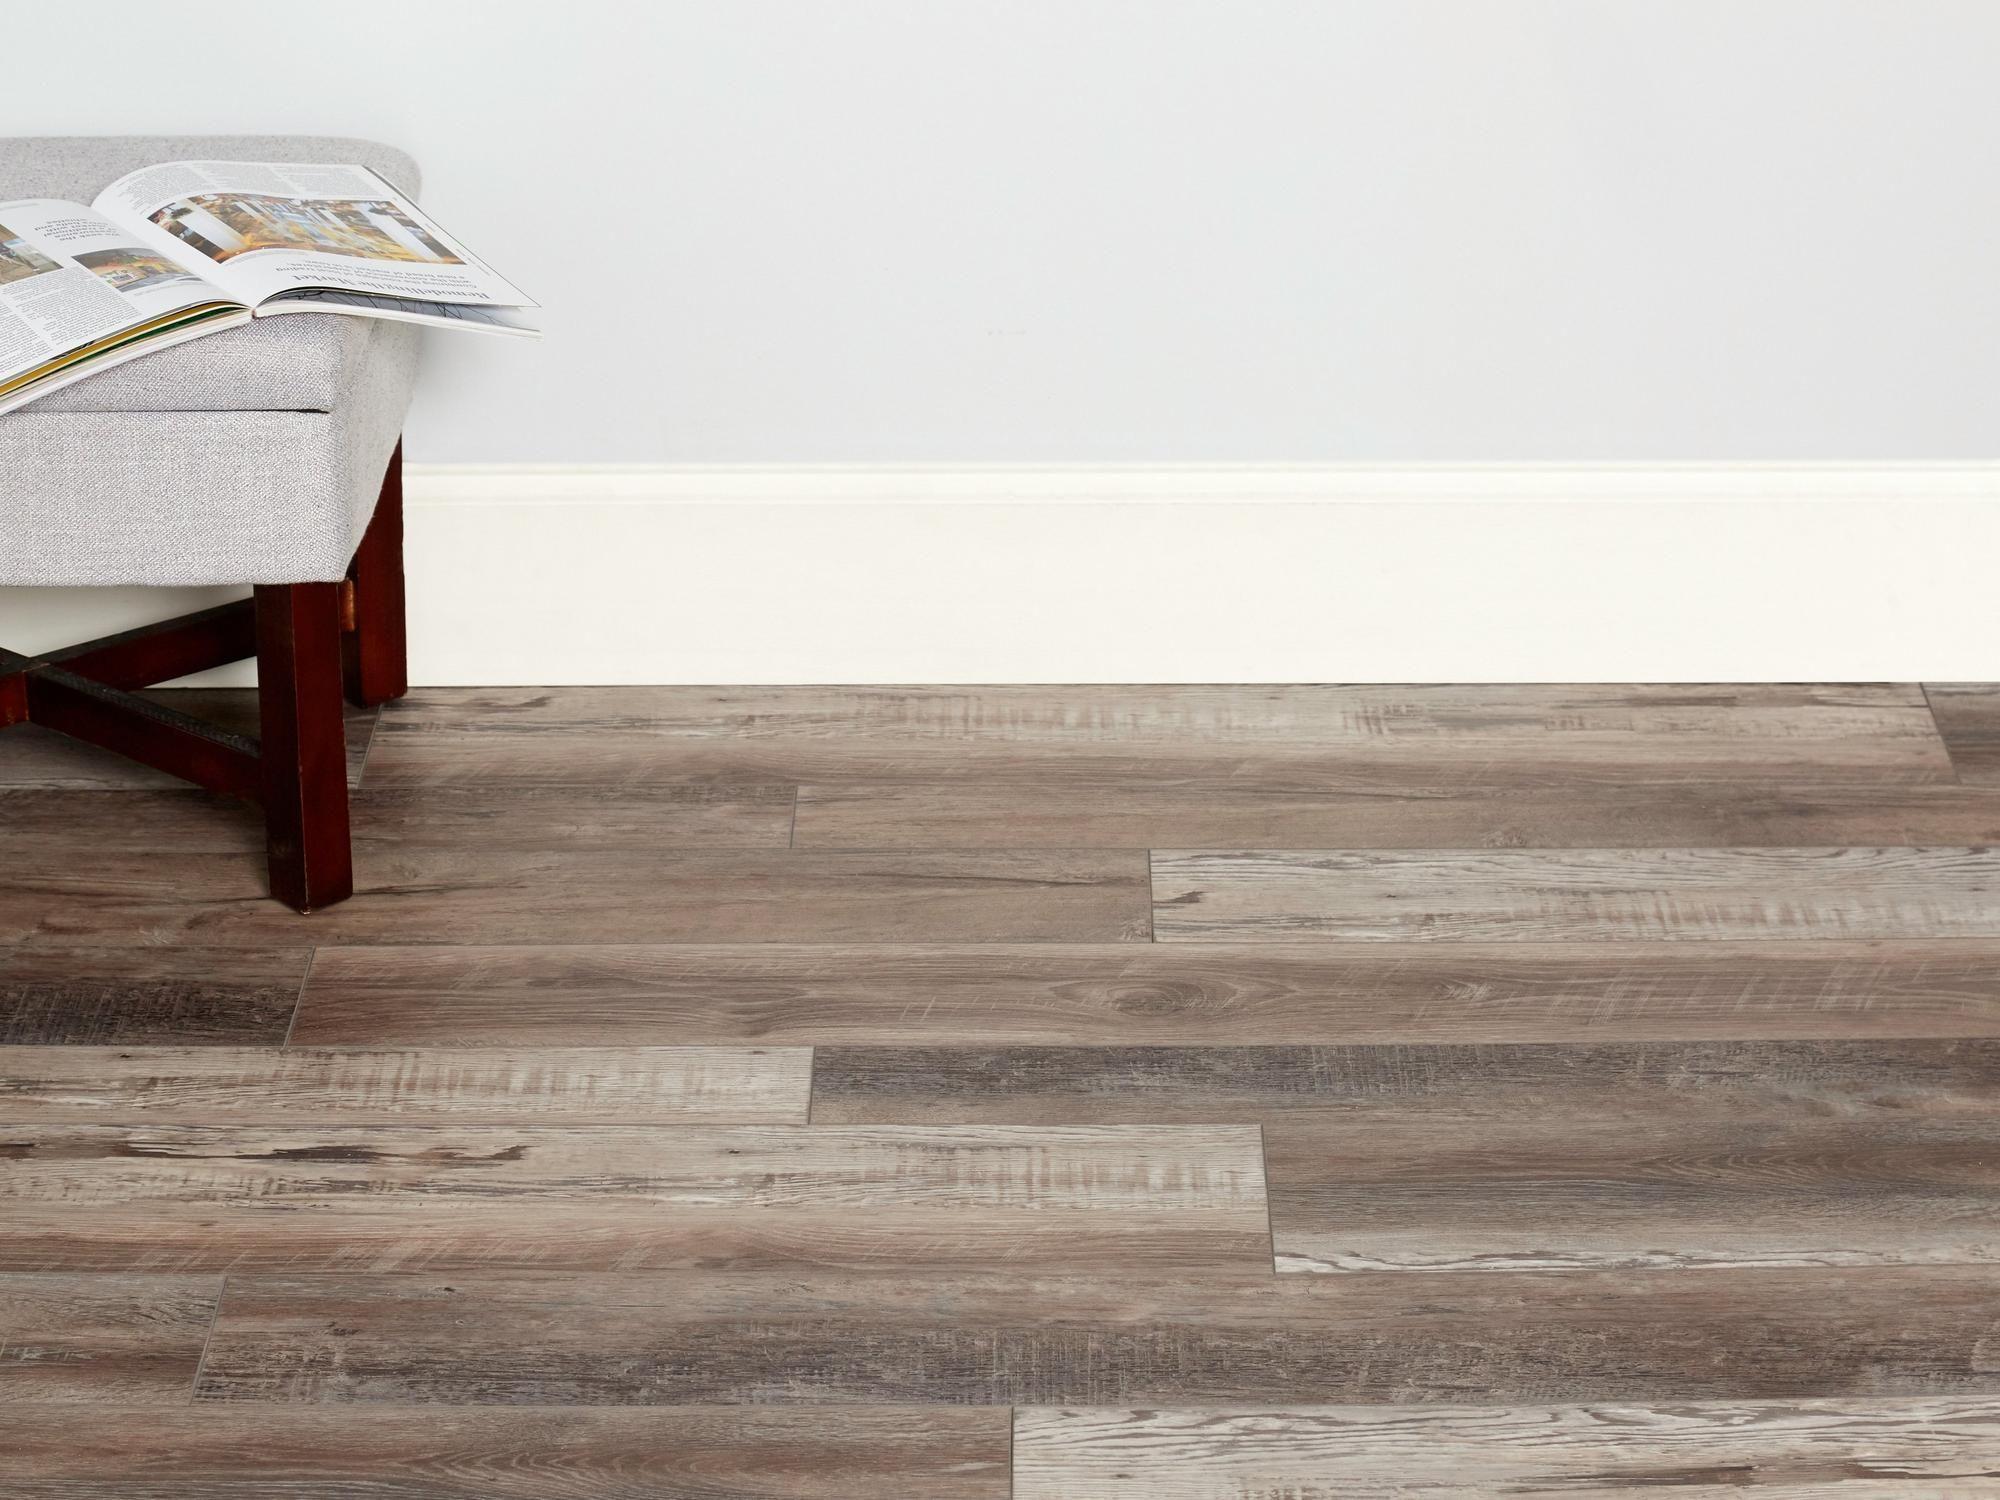 Cortado Oak Rigid Core Luxury Vinyl Plank Cork Back 6 5mm 100582717 Floor And Decor In 2020 Luxury Vinyl Plank Vinyl Plank Luxury Vinyl